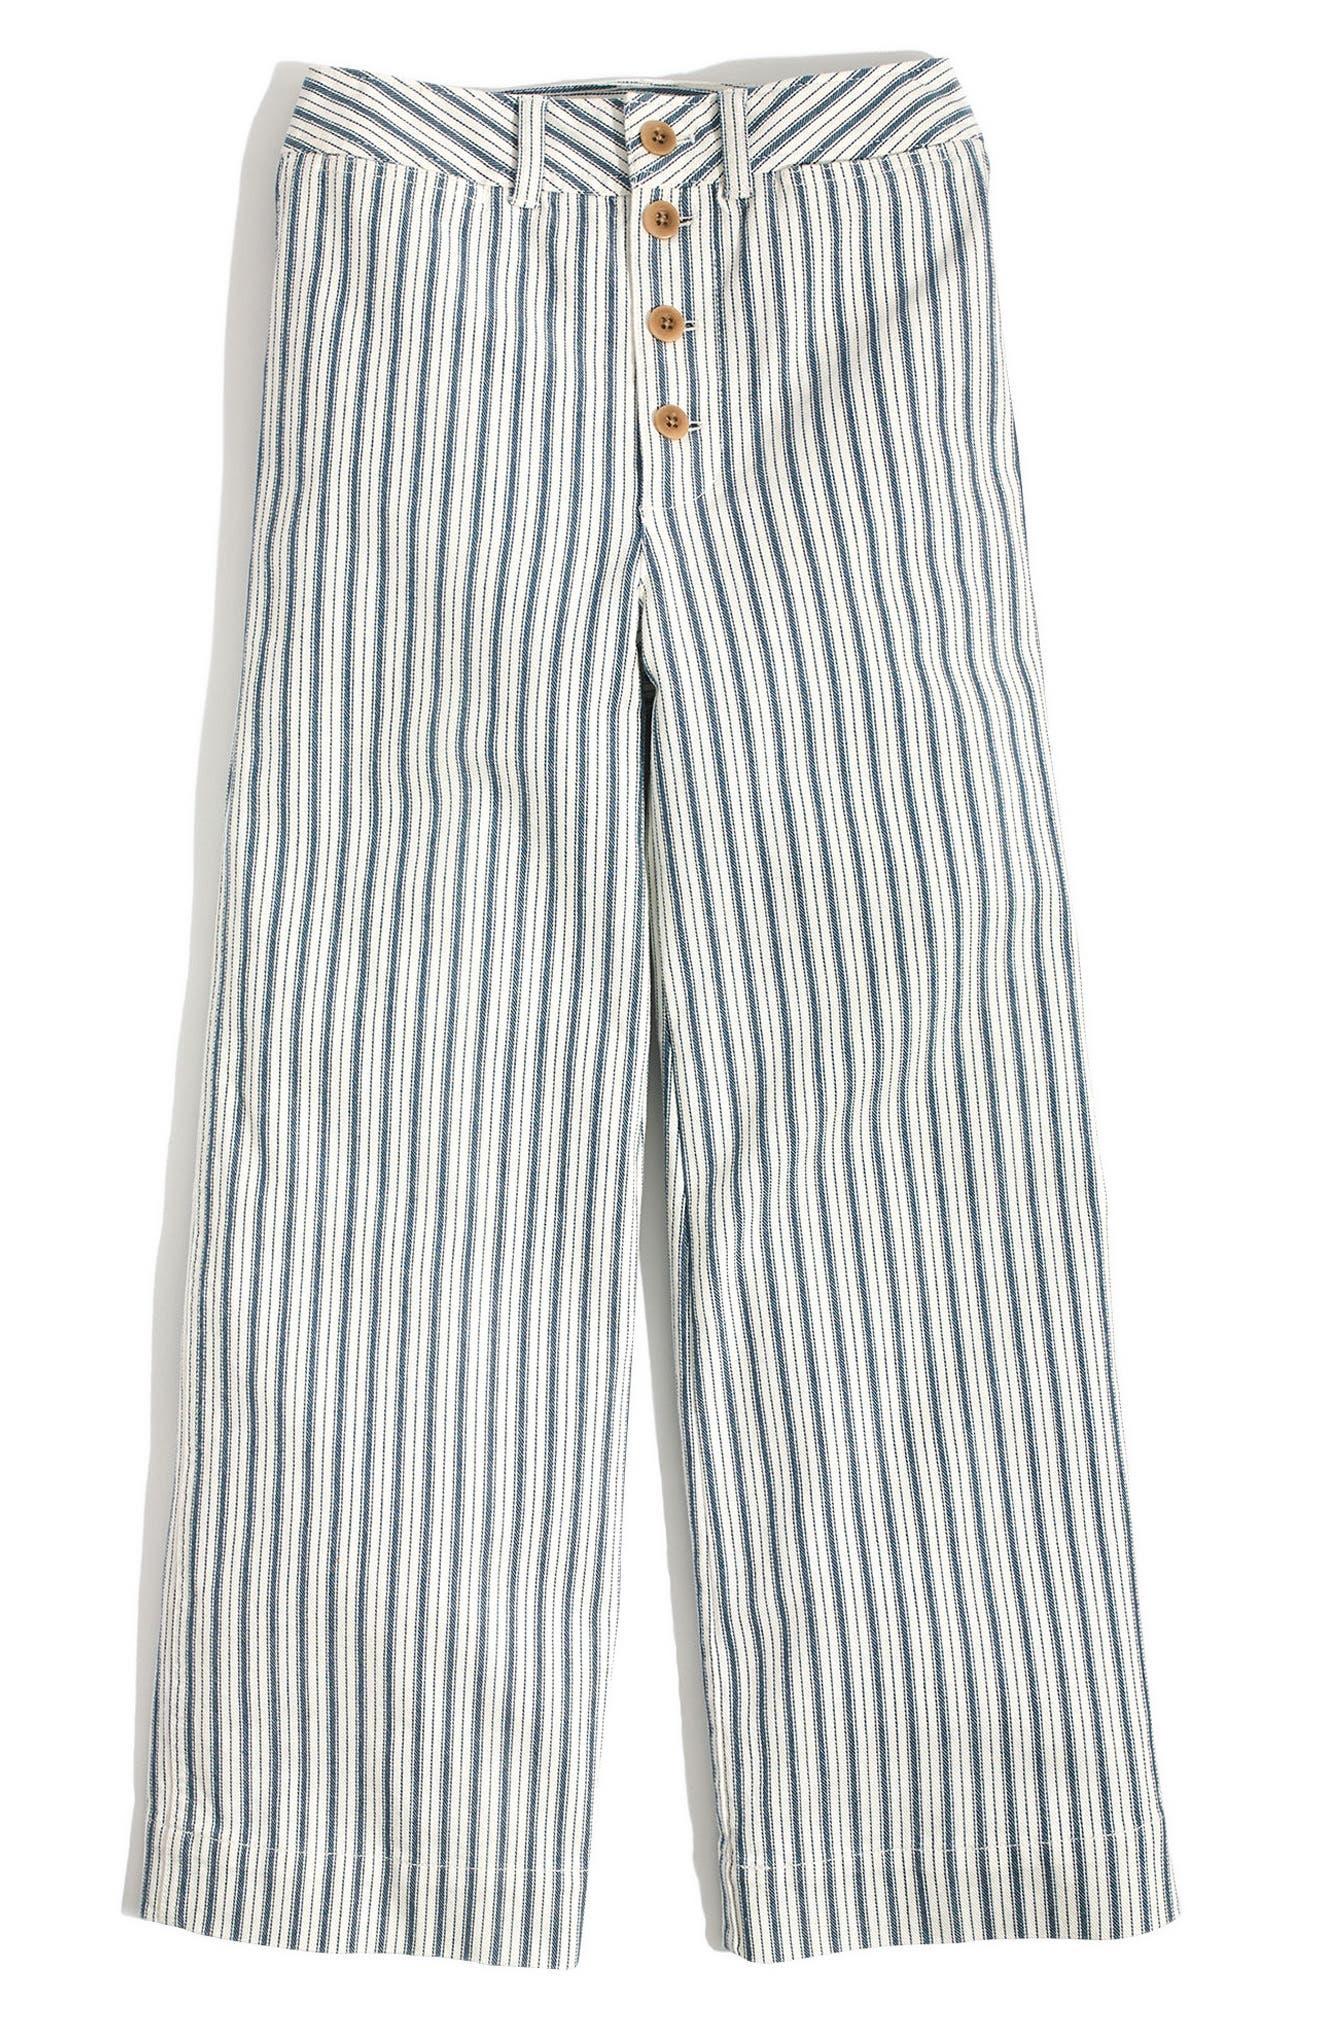 Madewell Emmett Stripe Crop Wide Leg Pants